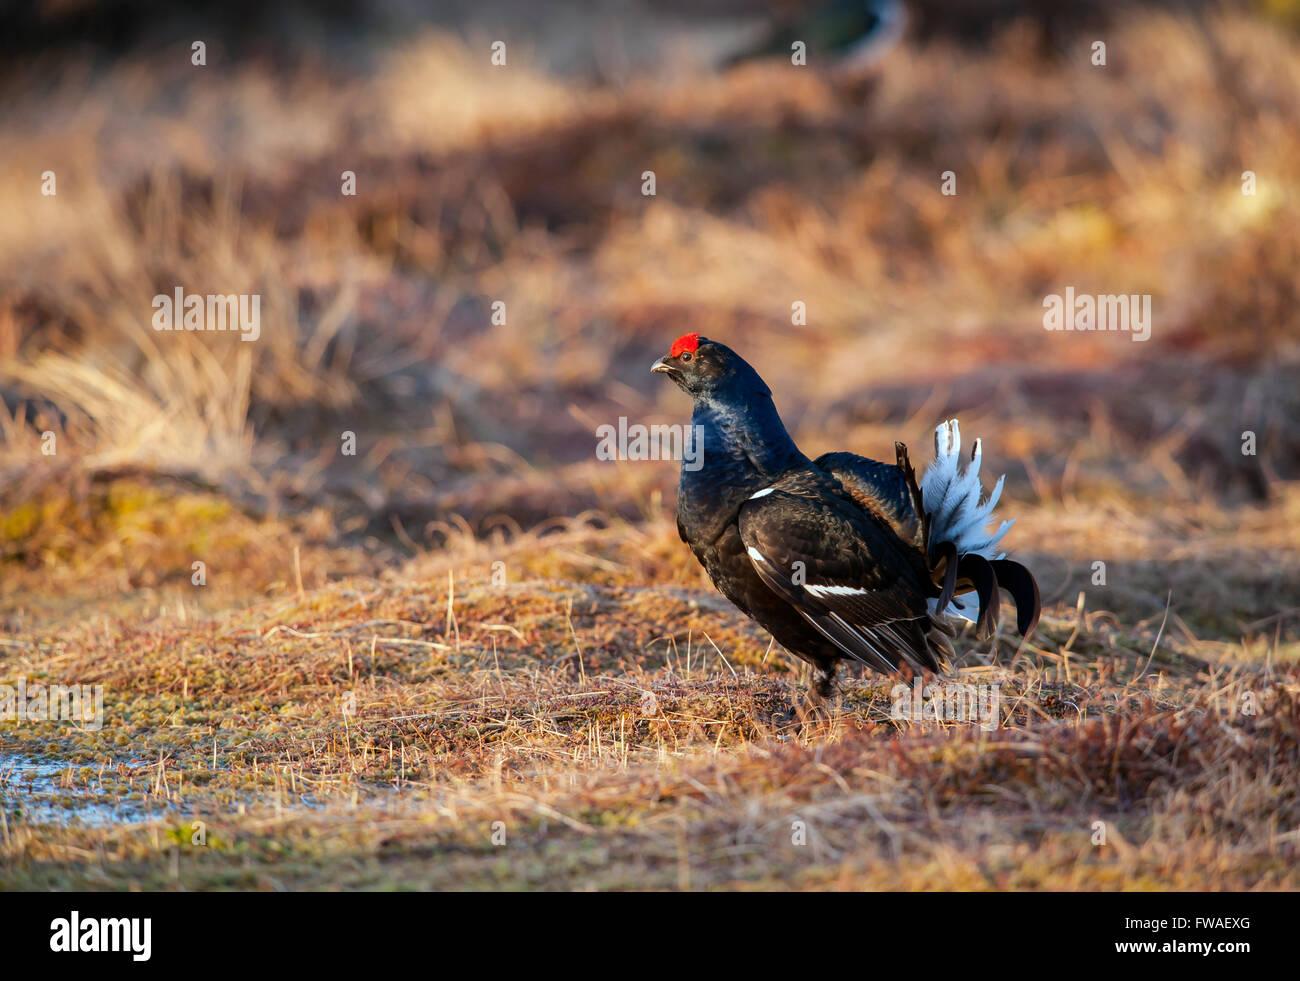 Black grouse (Tetrao tetrix) - Stock Image